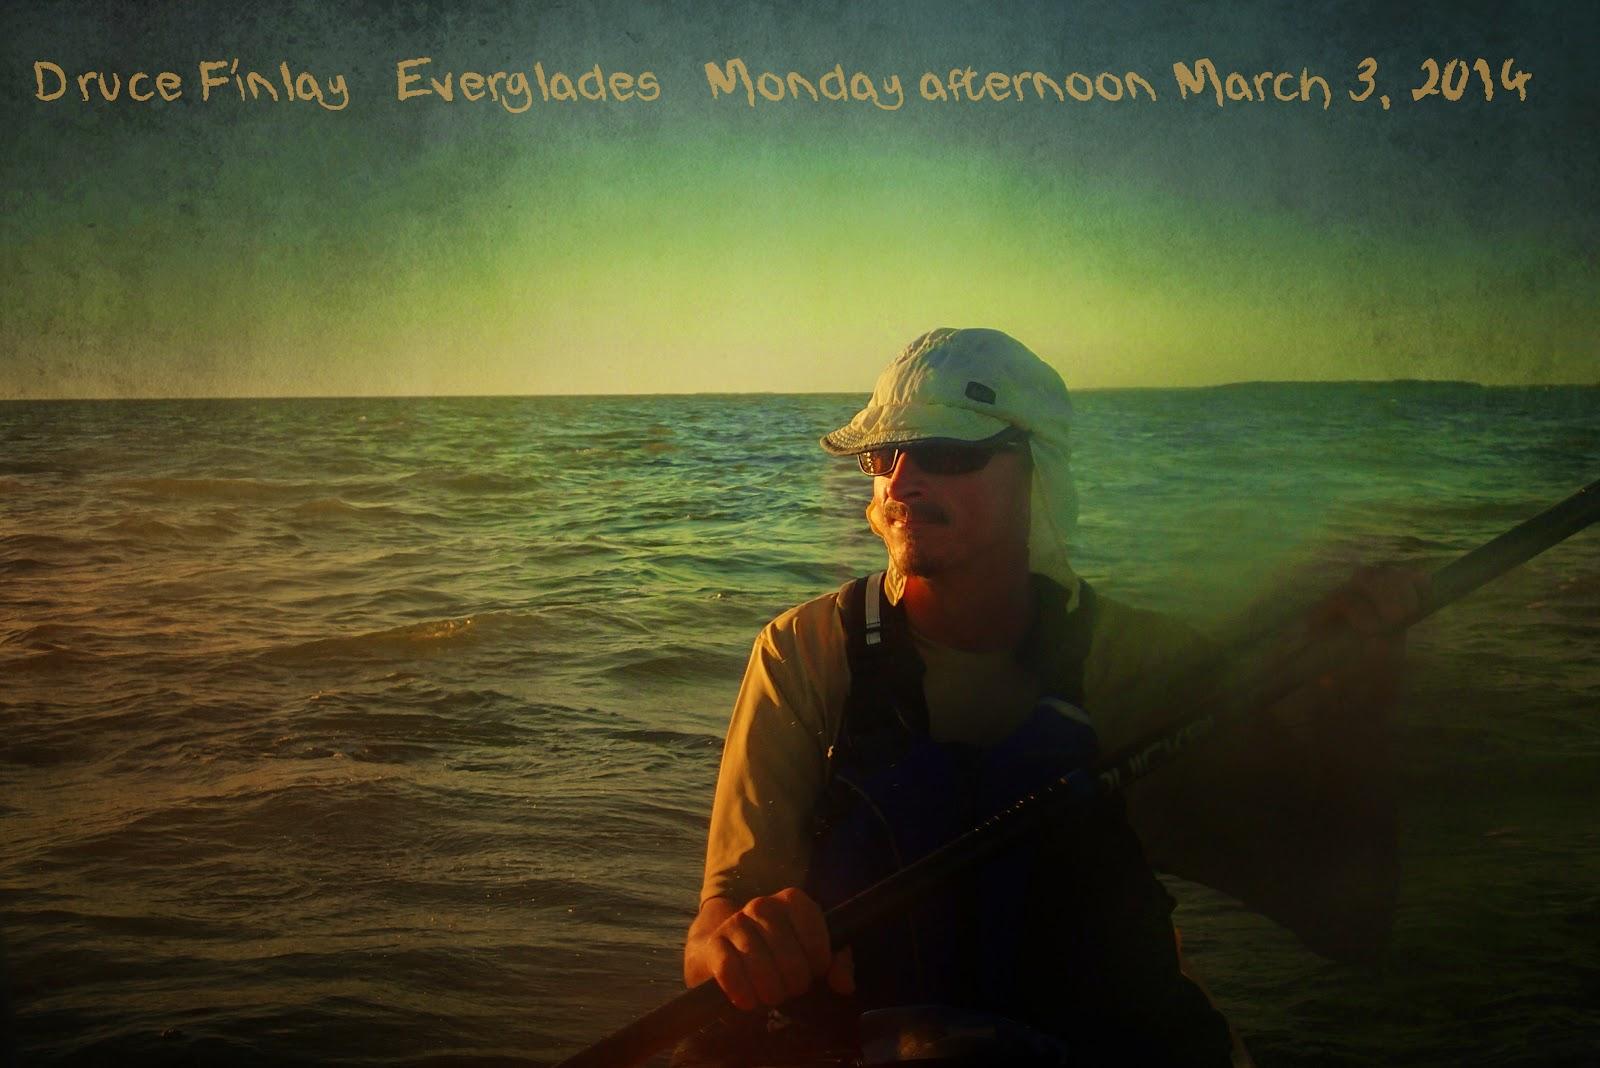 Druce Finlay Monday Afternoon - Everglades Challenge 2014